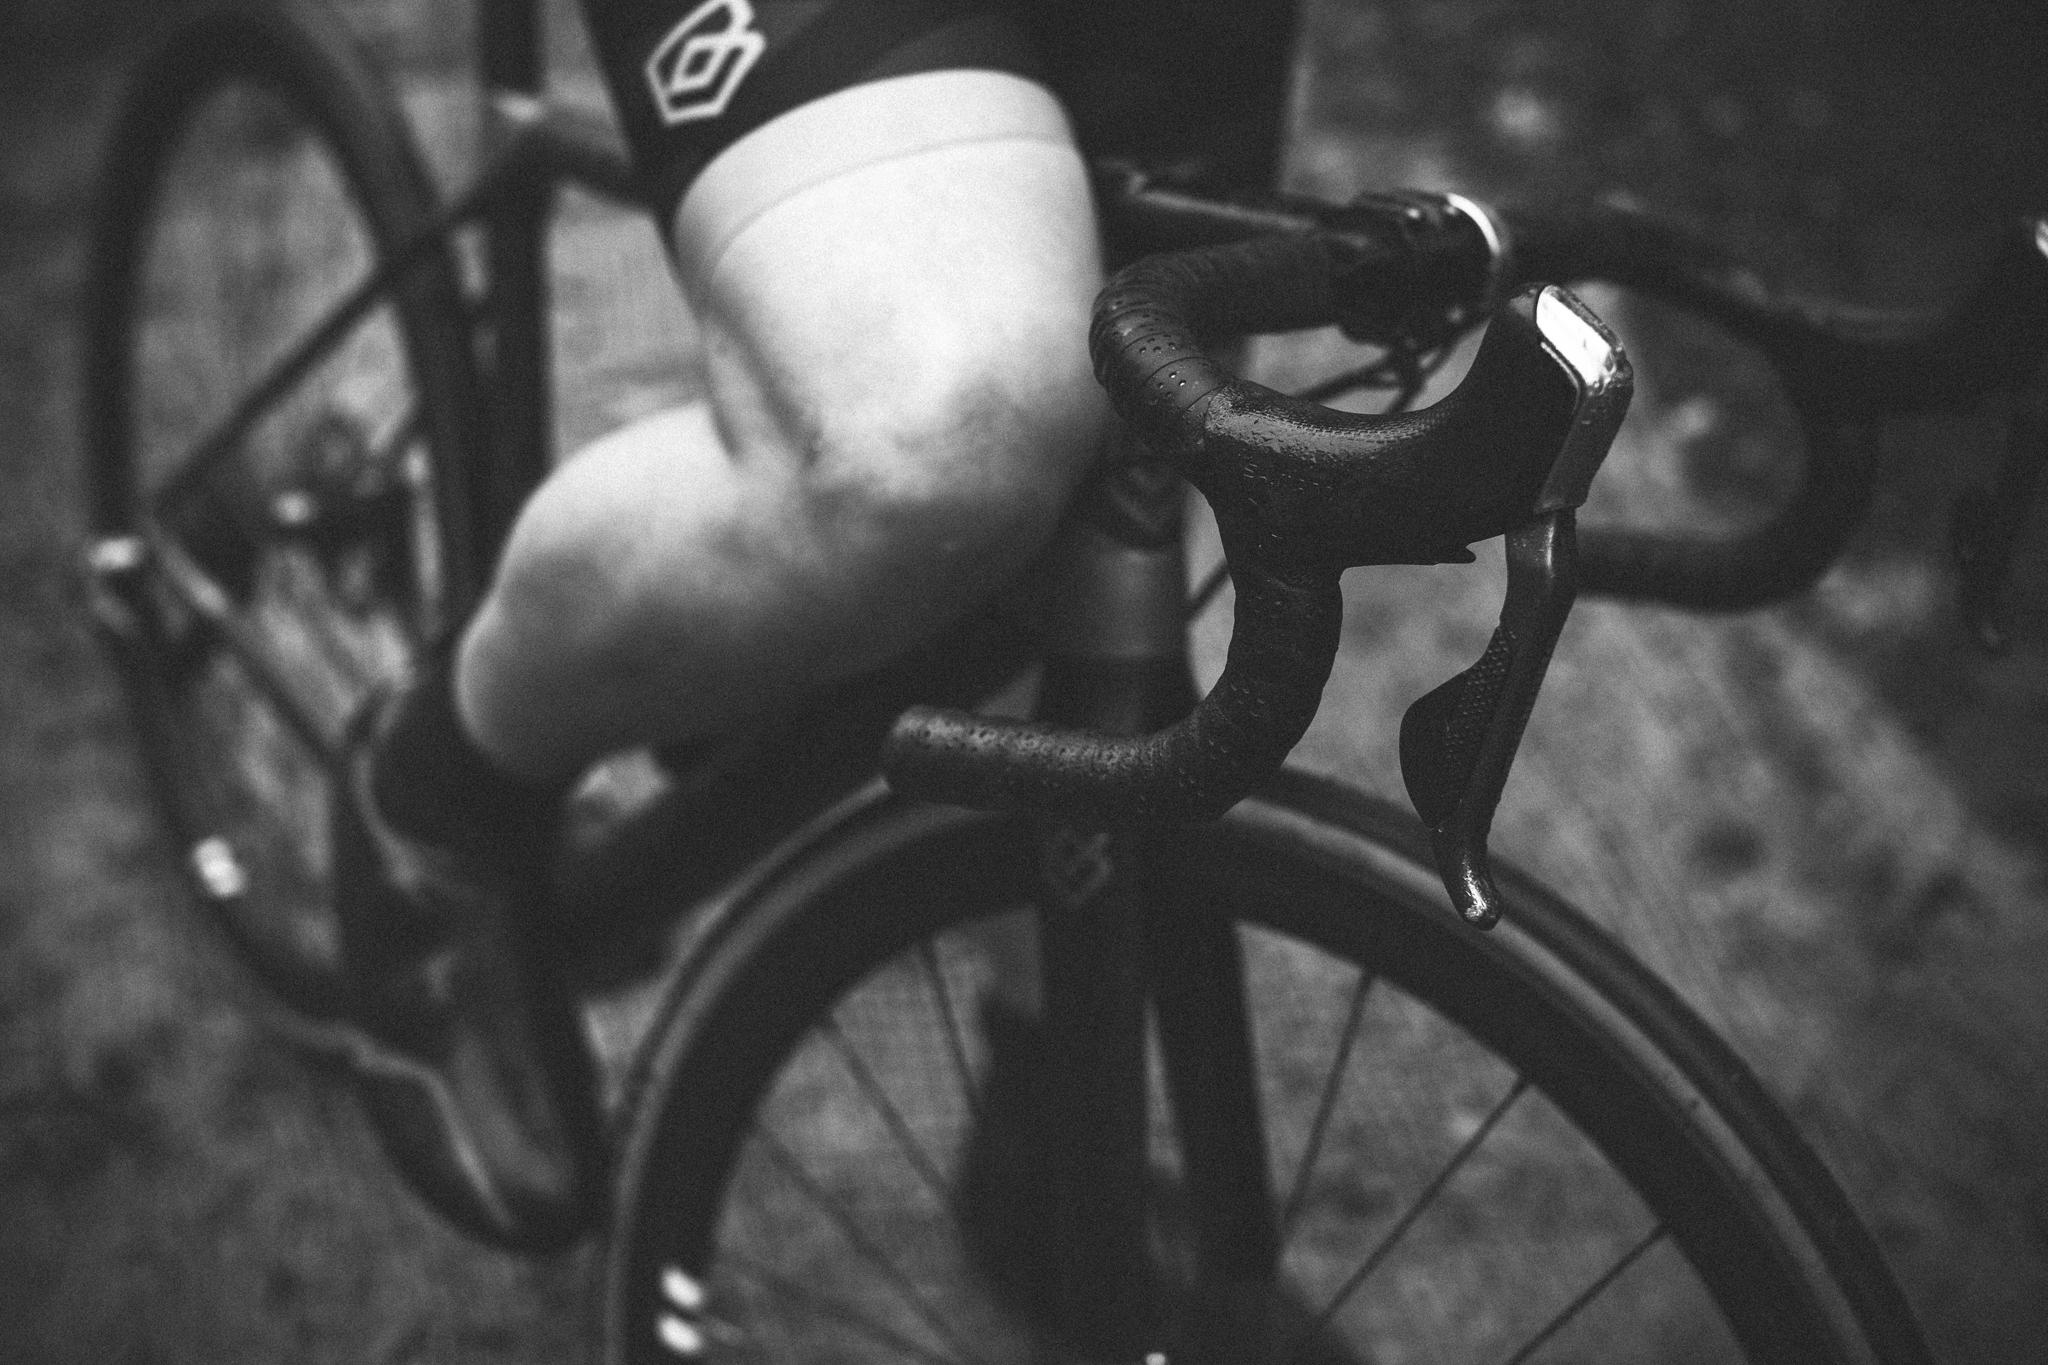 bastion cycles - gippslandia